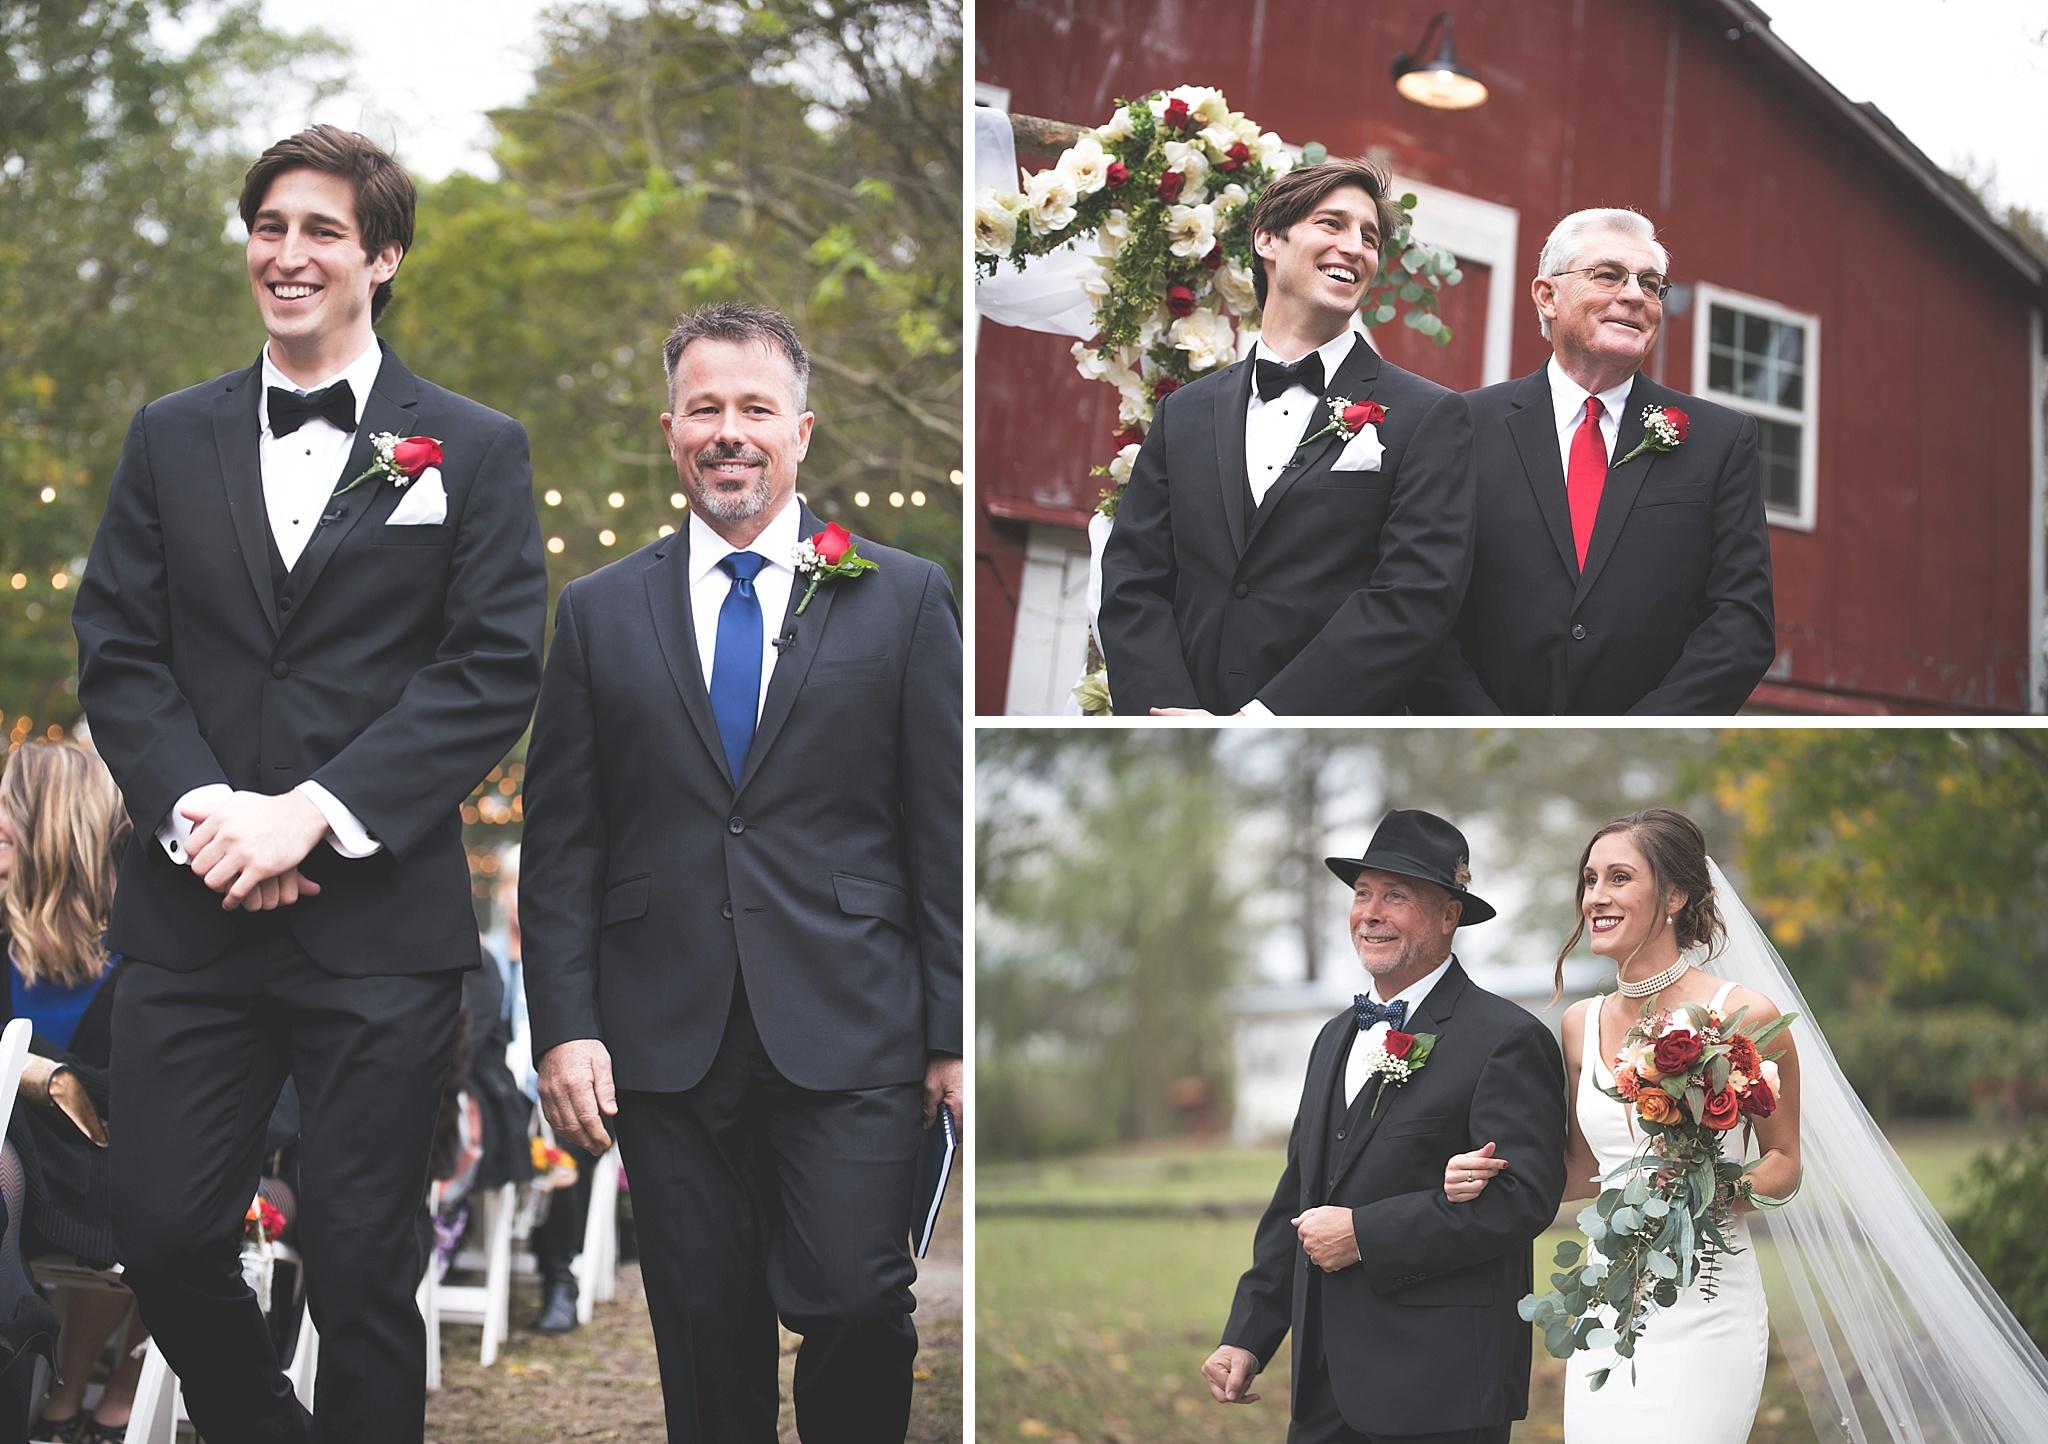 Grantham-House-Wedding-Photogrpaher-019.jpg